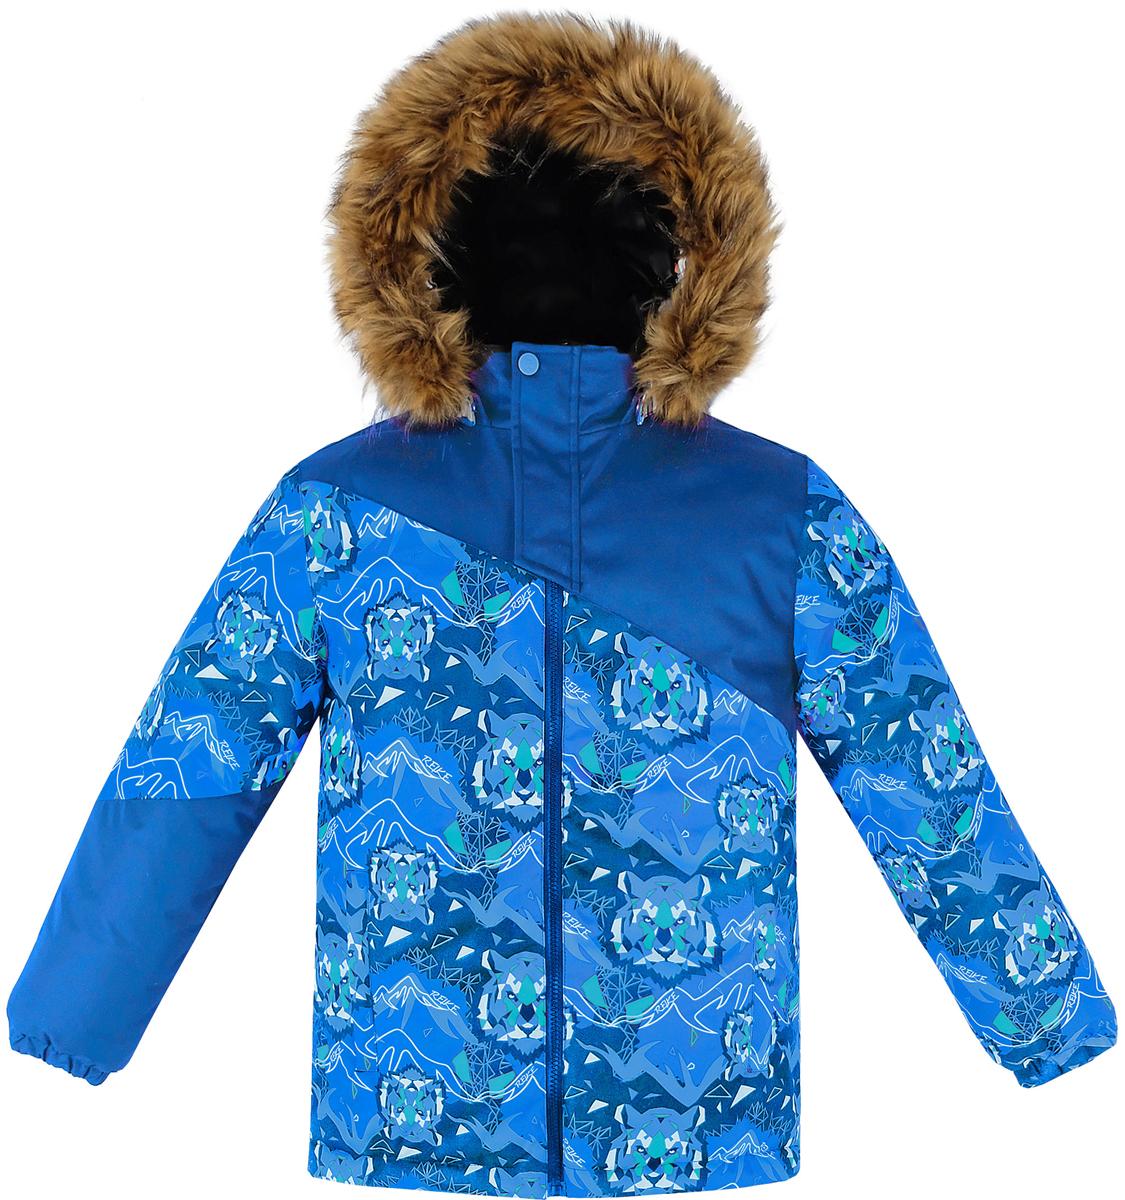 Куртка для мальчика Reike, цвет: темно-синий. 39255220_TGR navy. Размер 13439255220_TGR navy